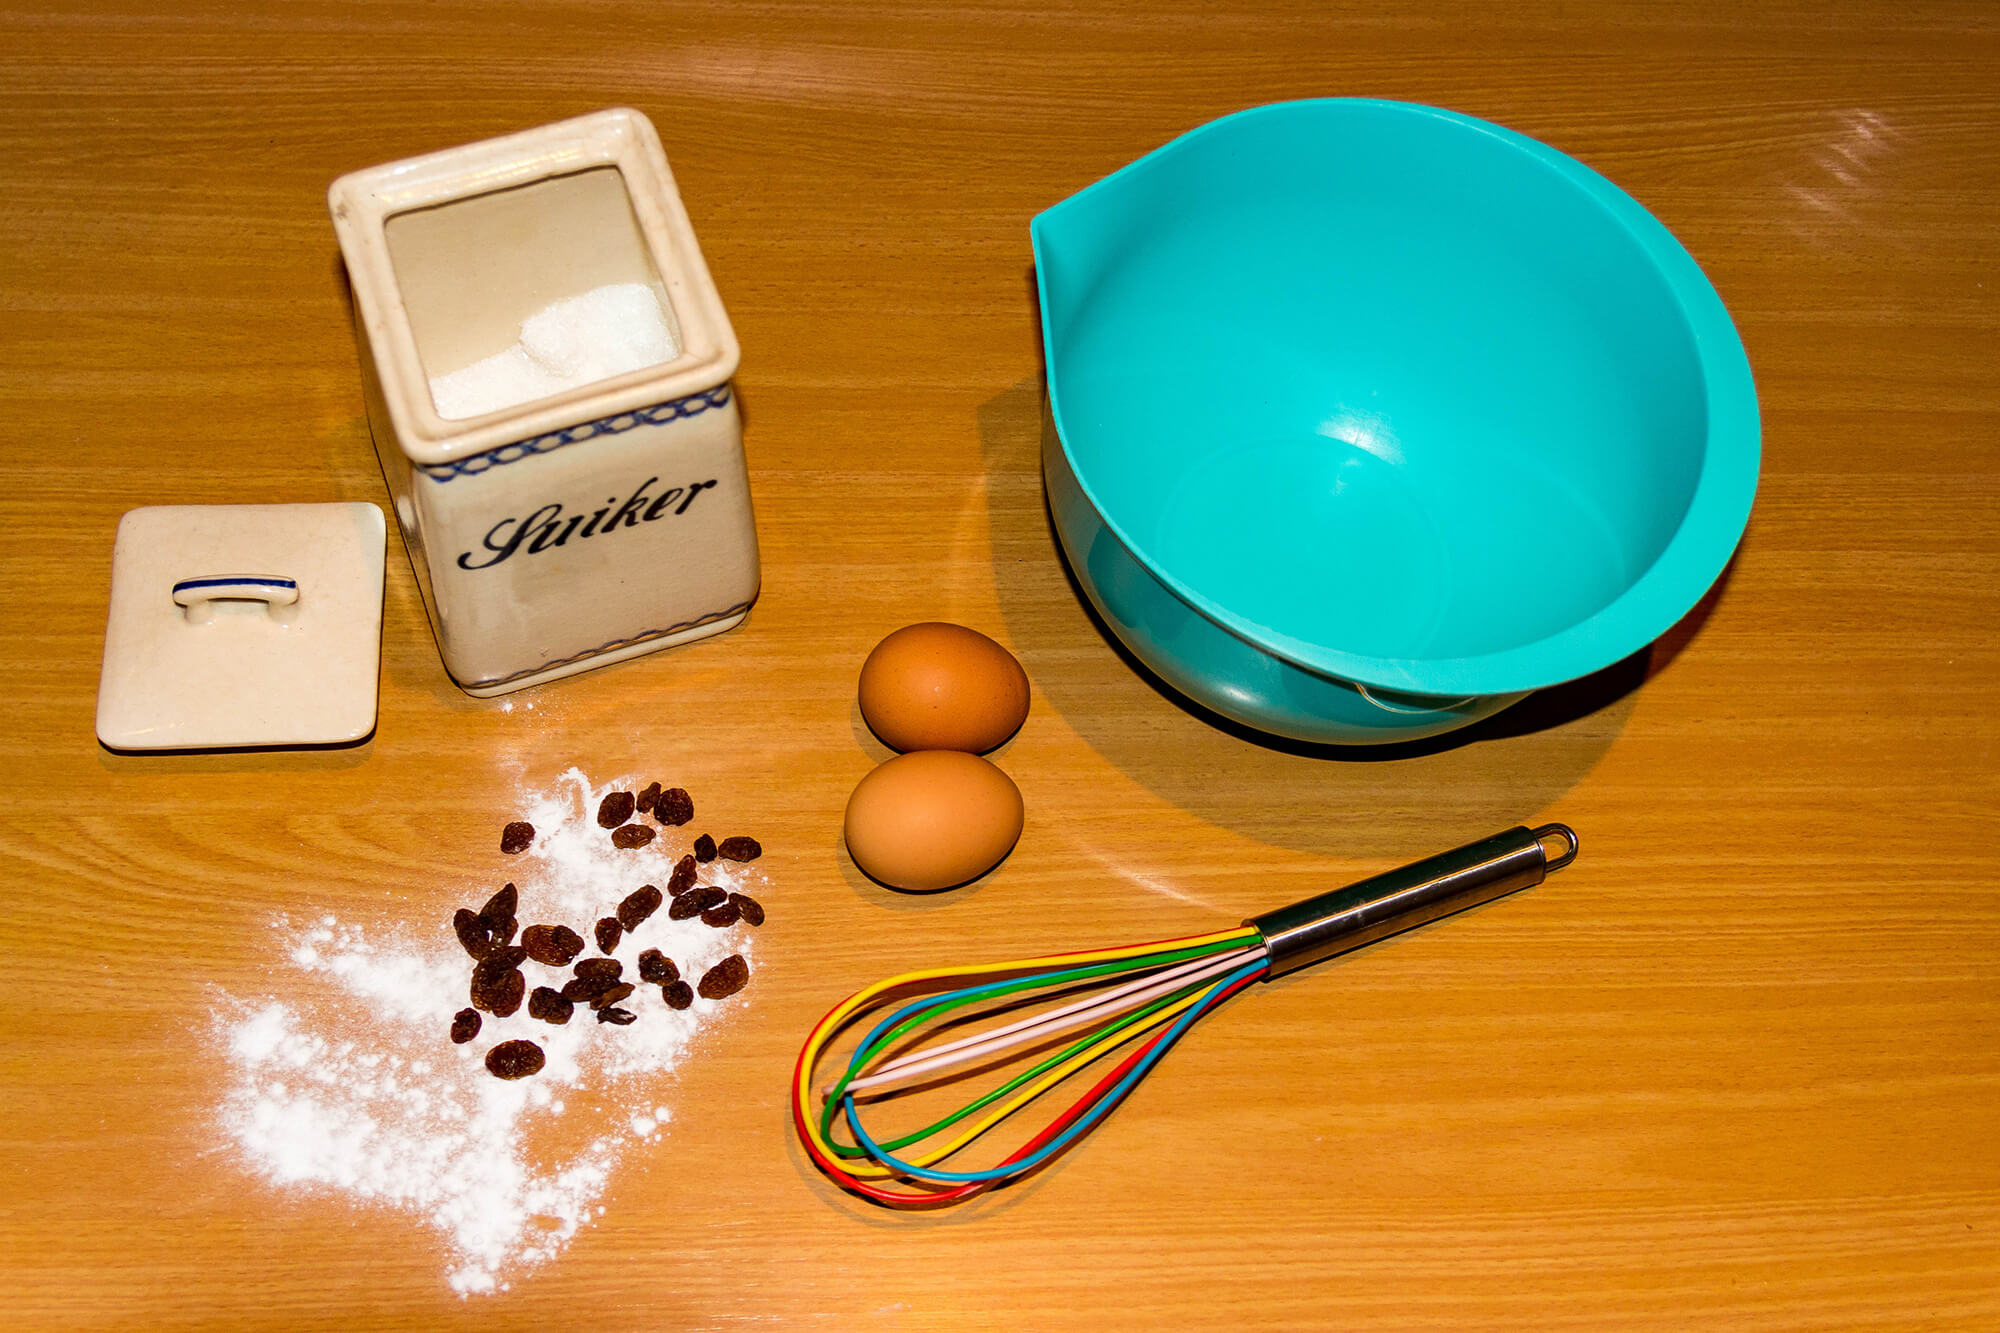 Baking Stuff To Make Oliebollen